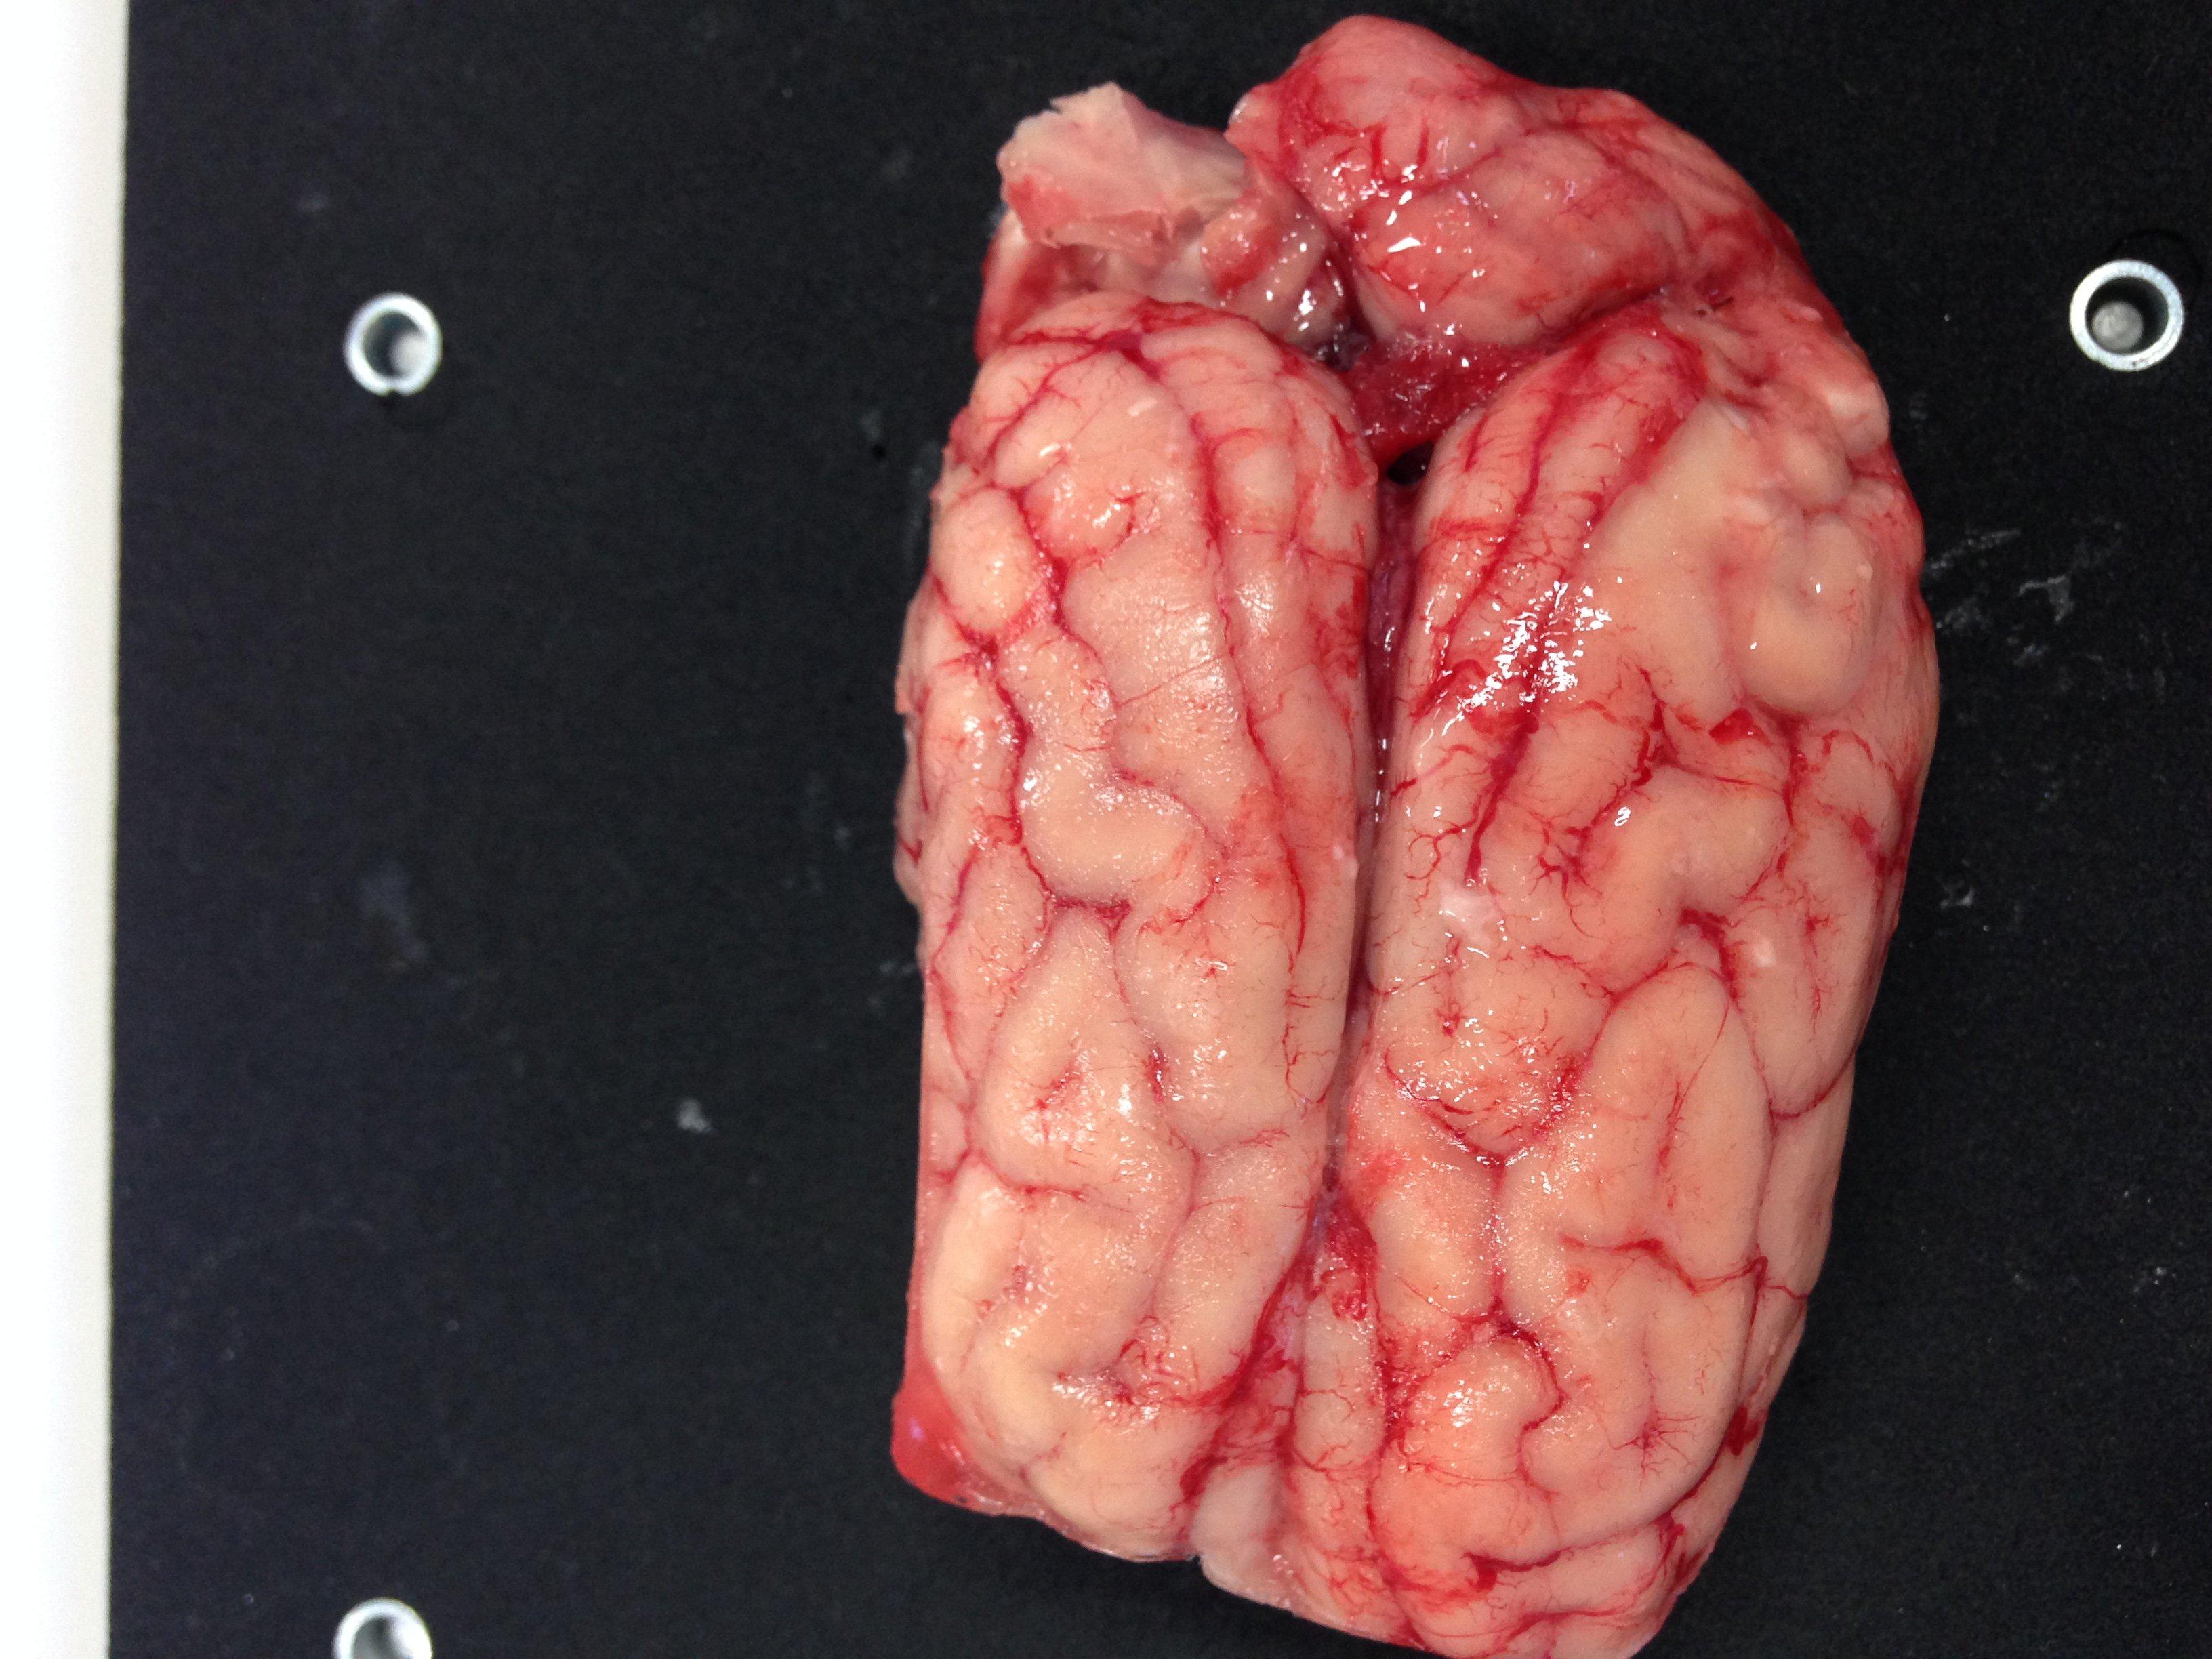 maladie alzheimer stade avance